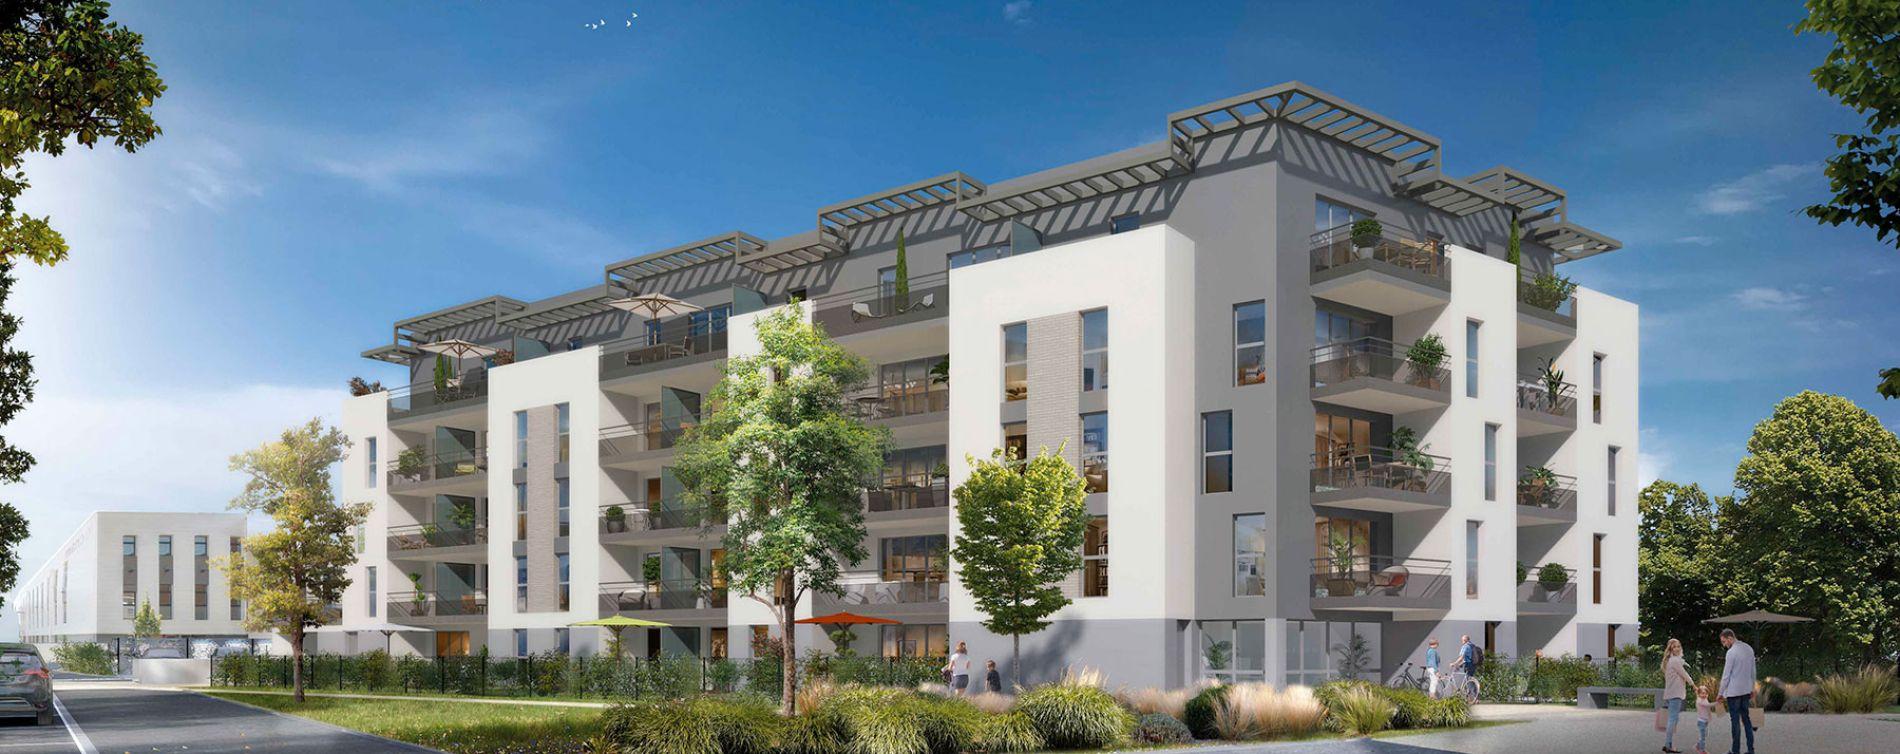 Résidence Foglia à Angers